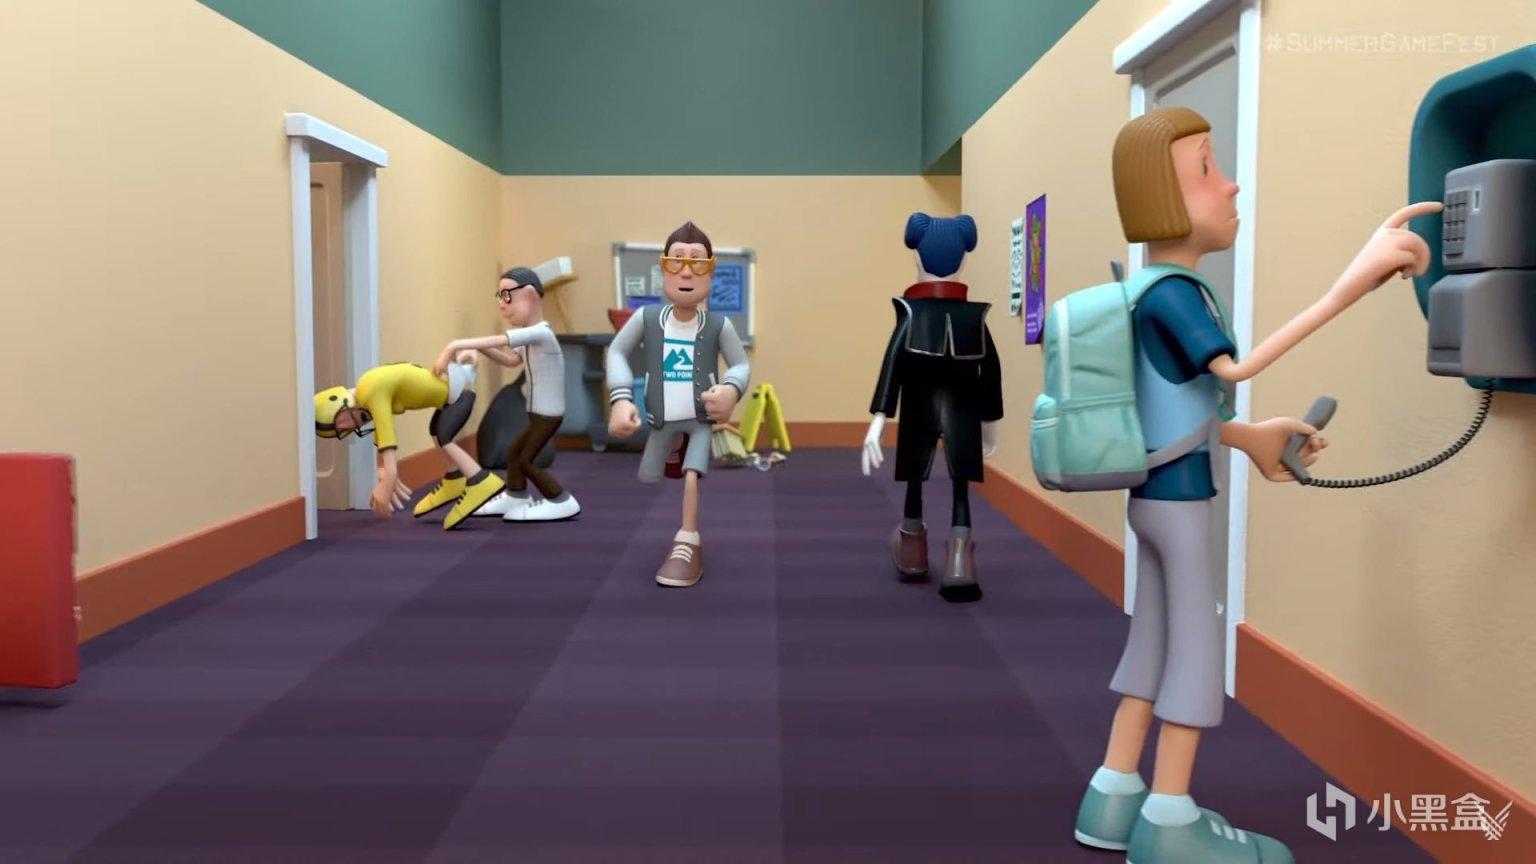 E3夏季游戏节:双点医院开发商新作《双点校园》正式公开